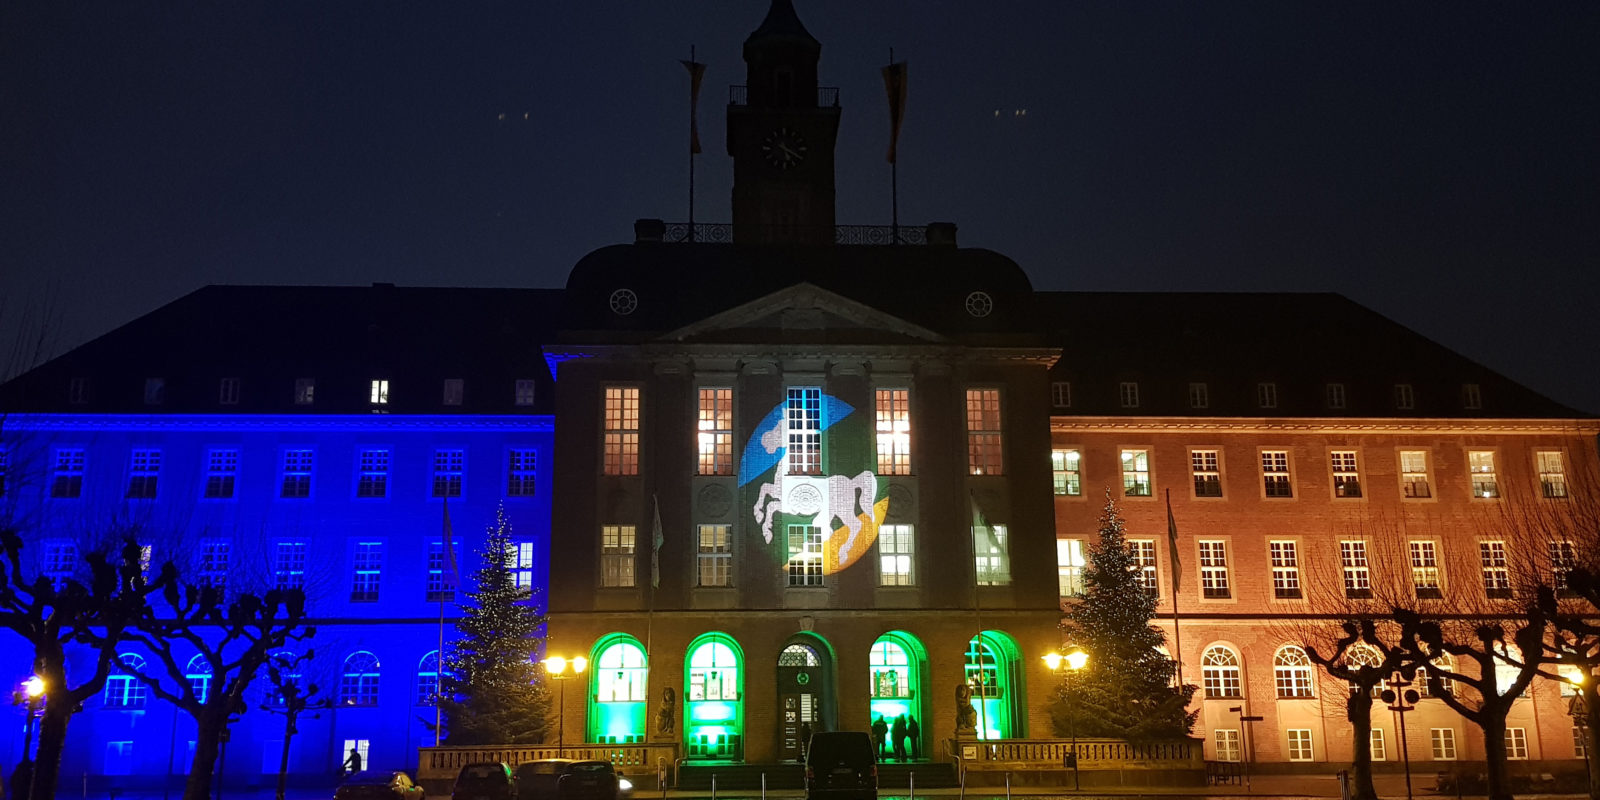 Rathaus Herne indirekt beleuchtet